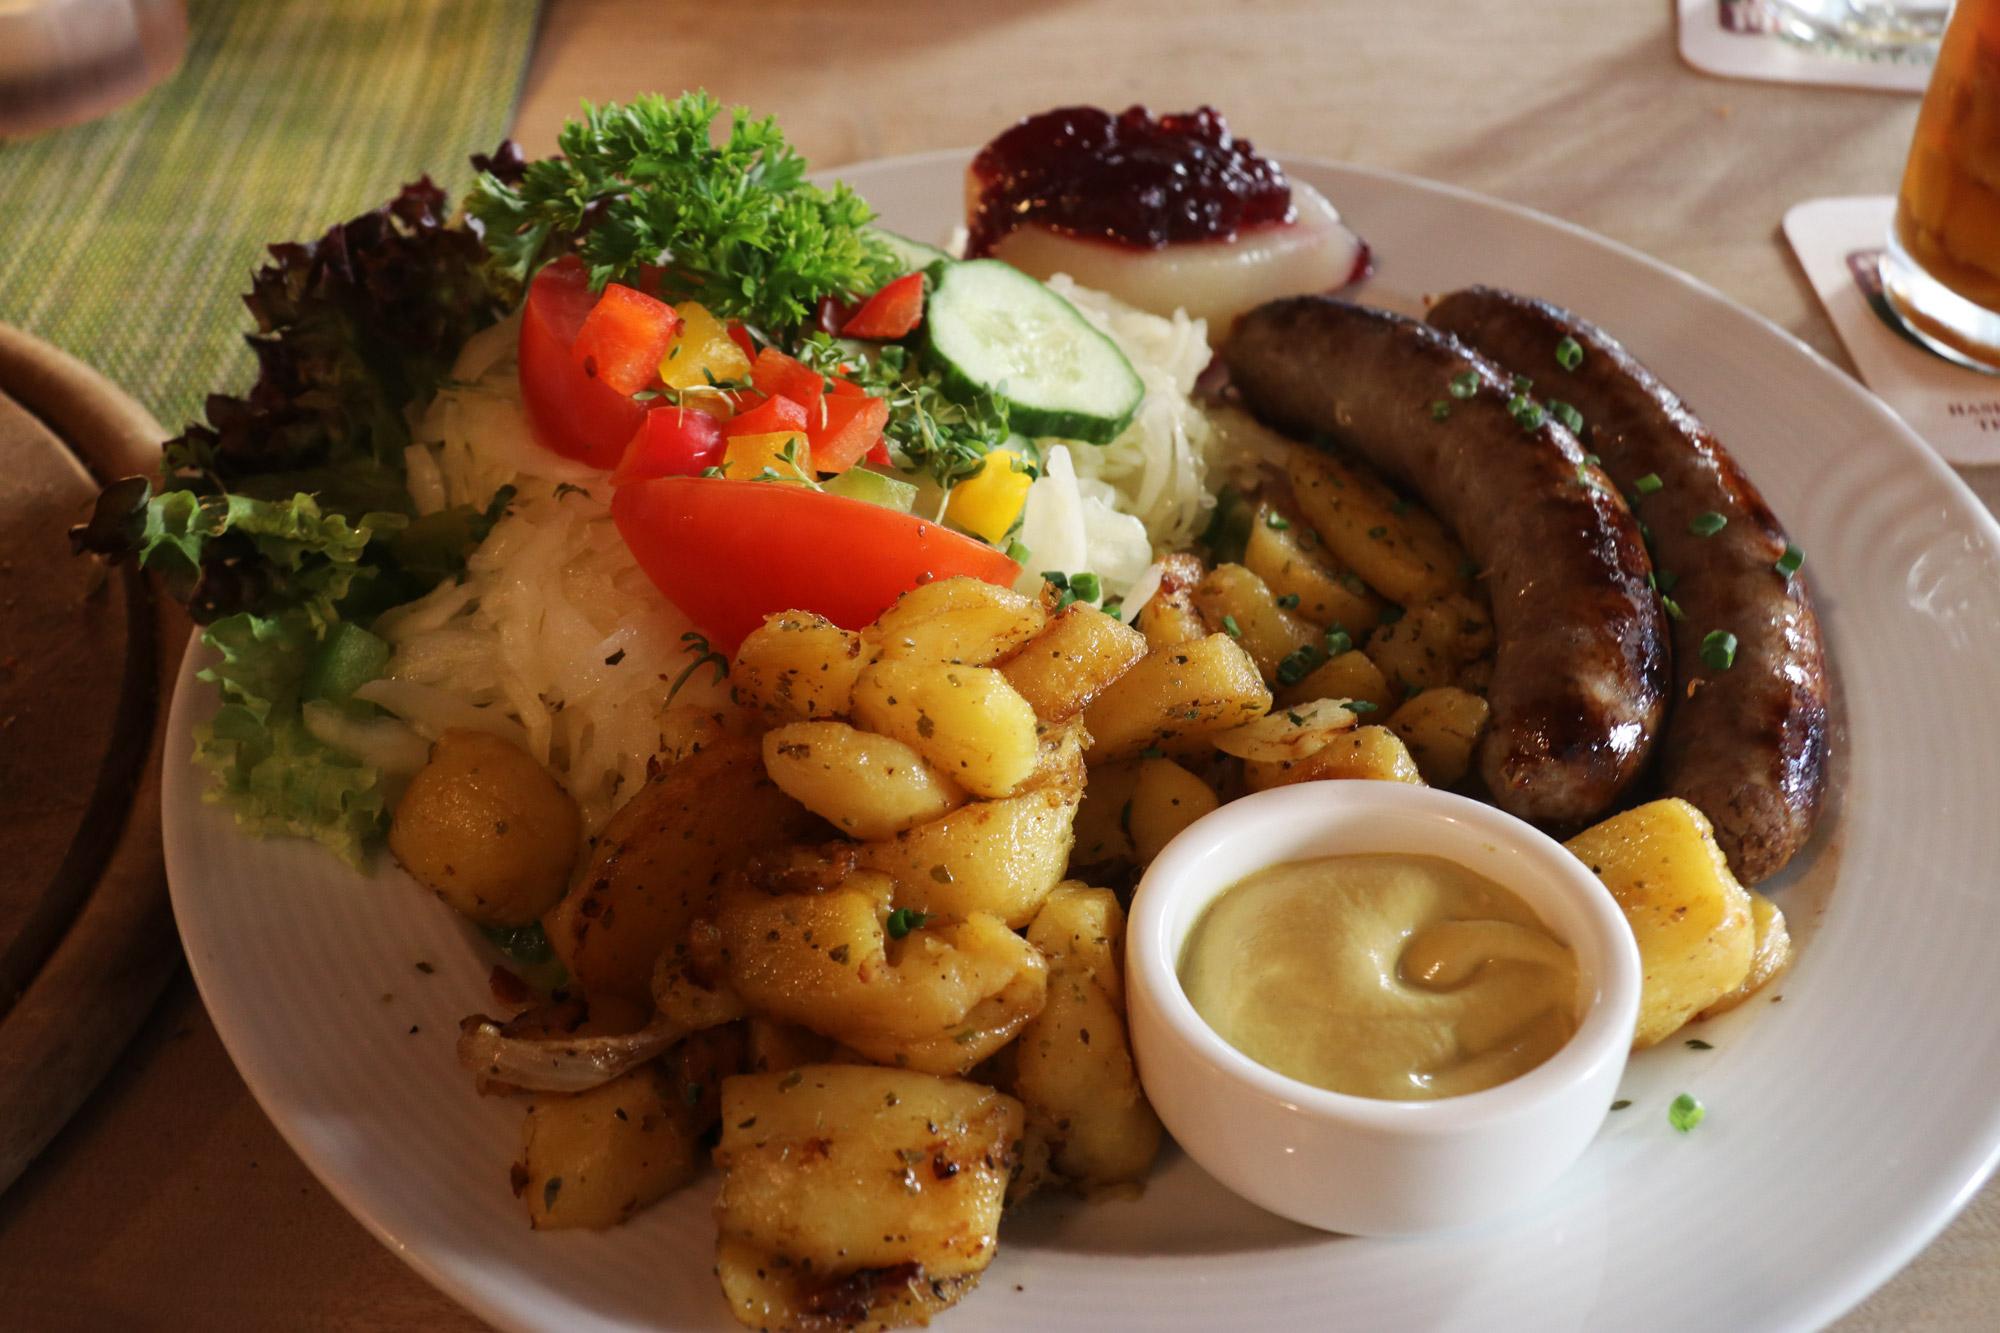 7x doen in Osnabrück - Eten bij Rampendahl Hausbrauerei